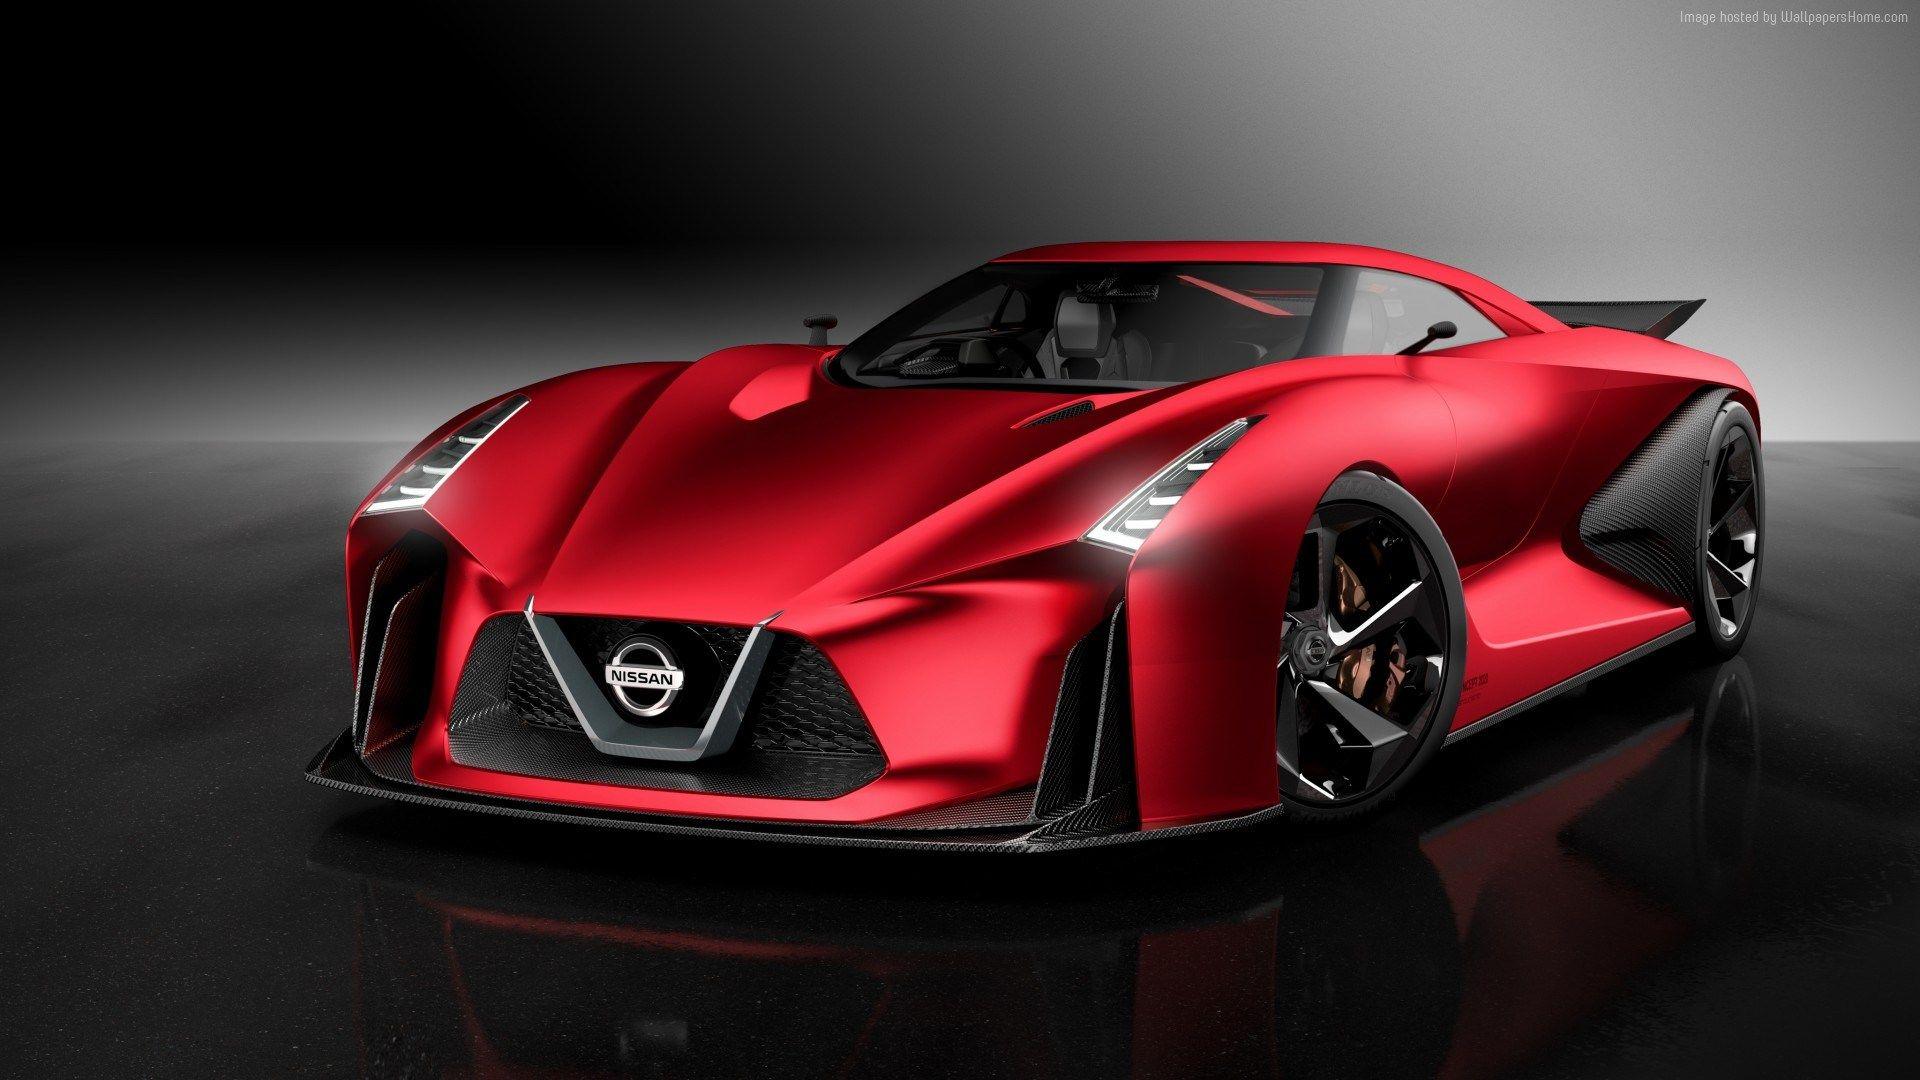 Nissan 2020 Vision Gran Turismo Wallpaper Konceptualnye Mashiny Nissan Superkary